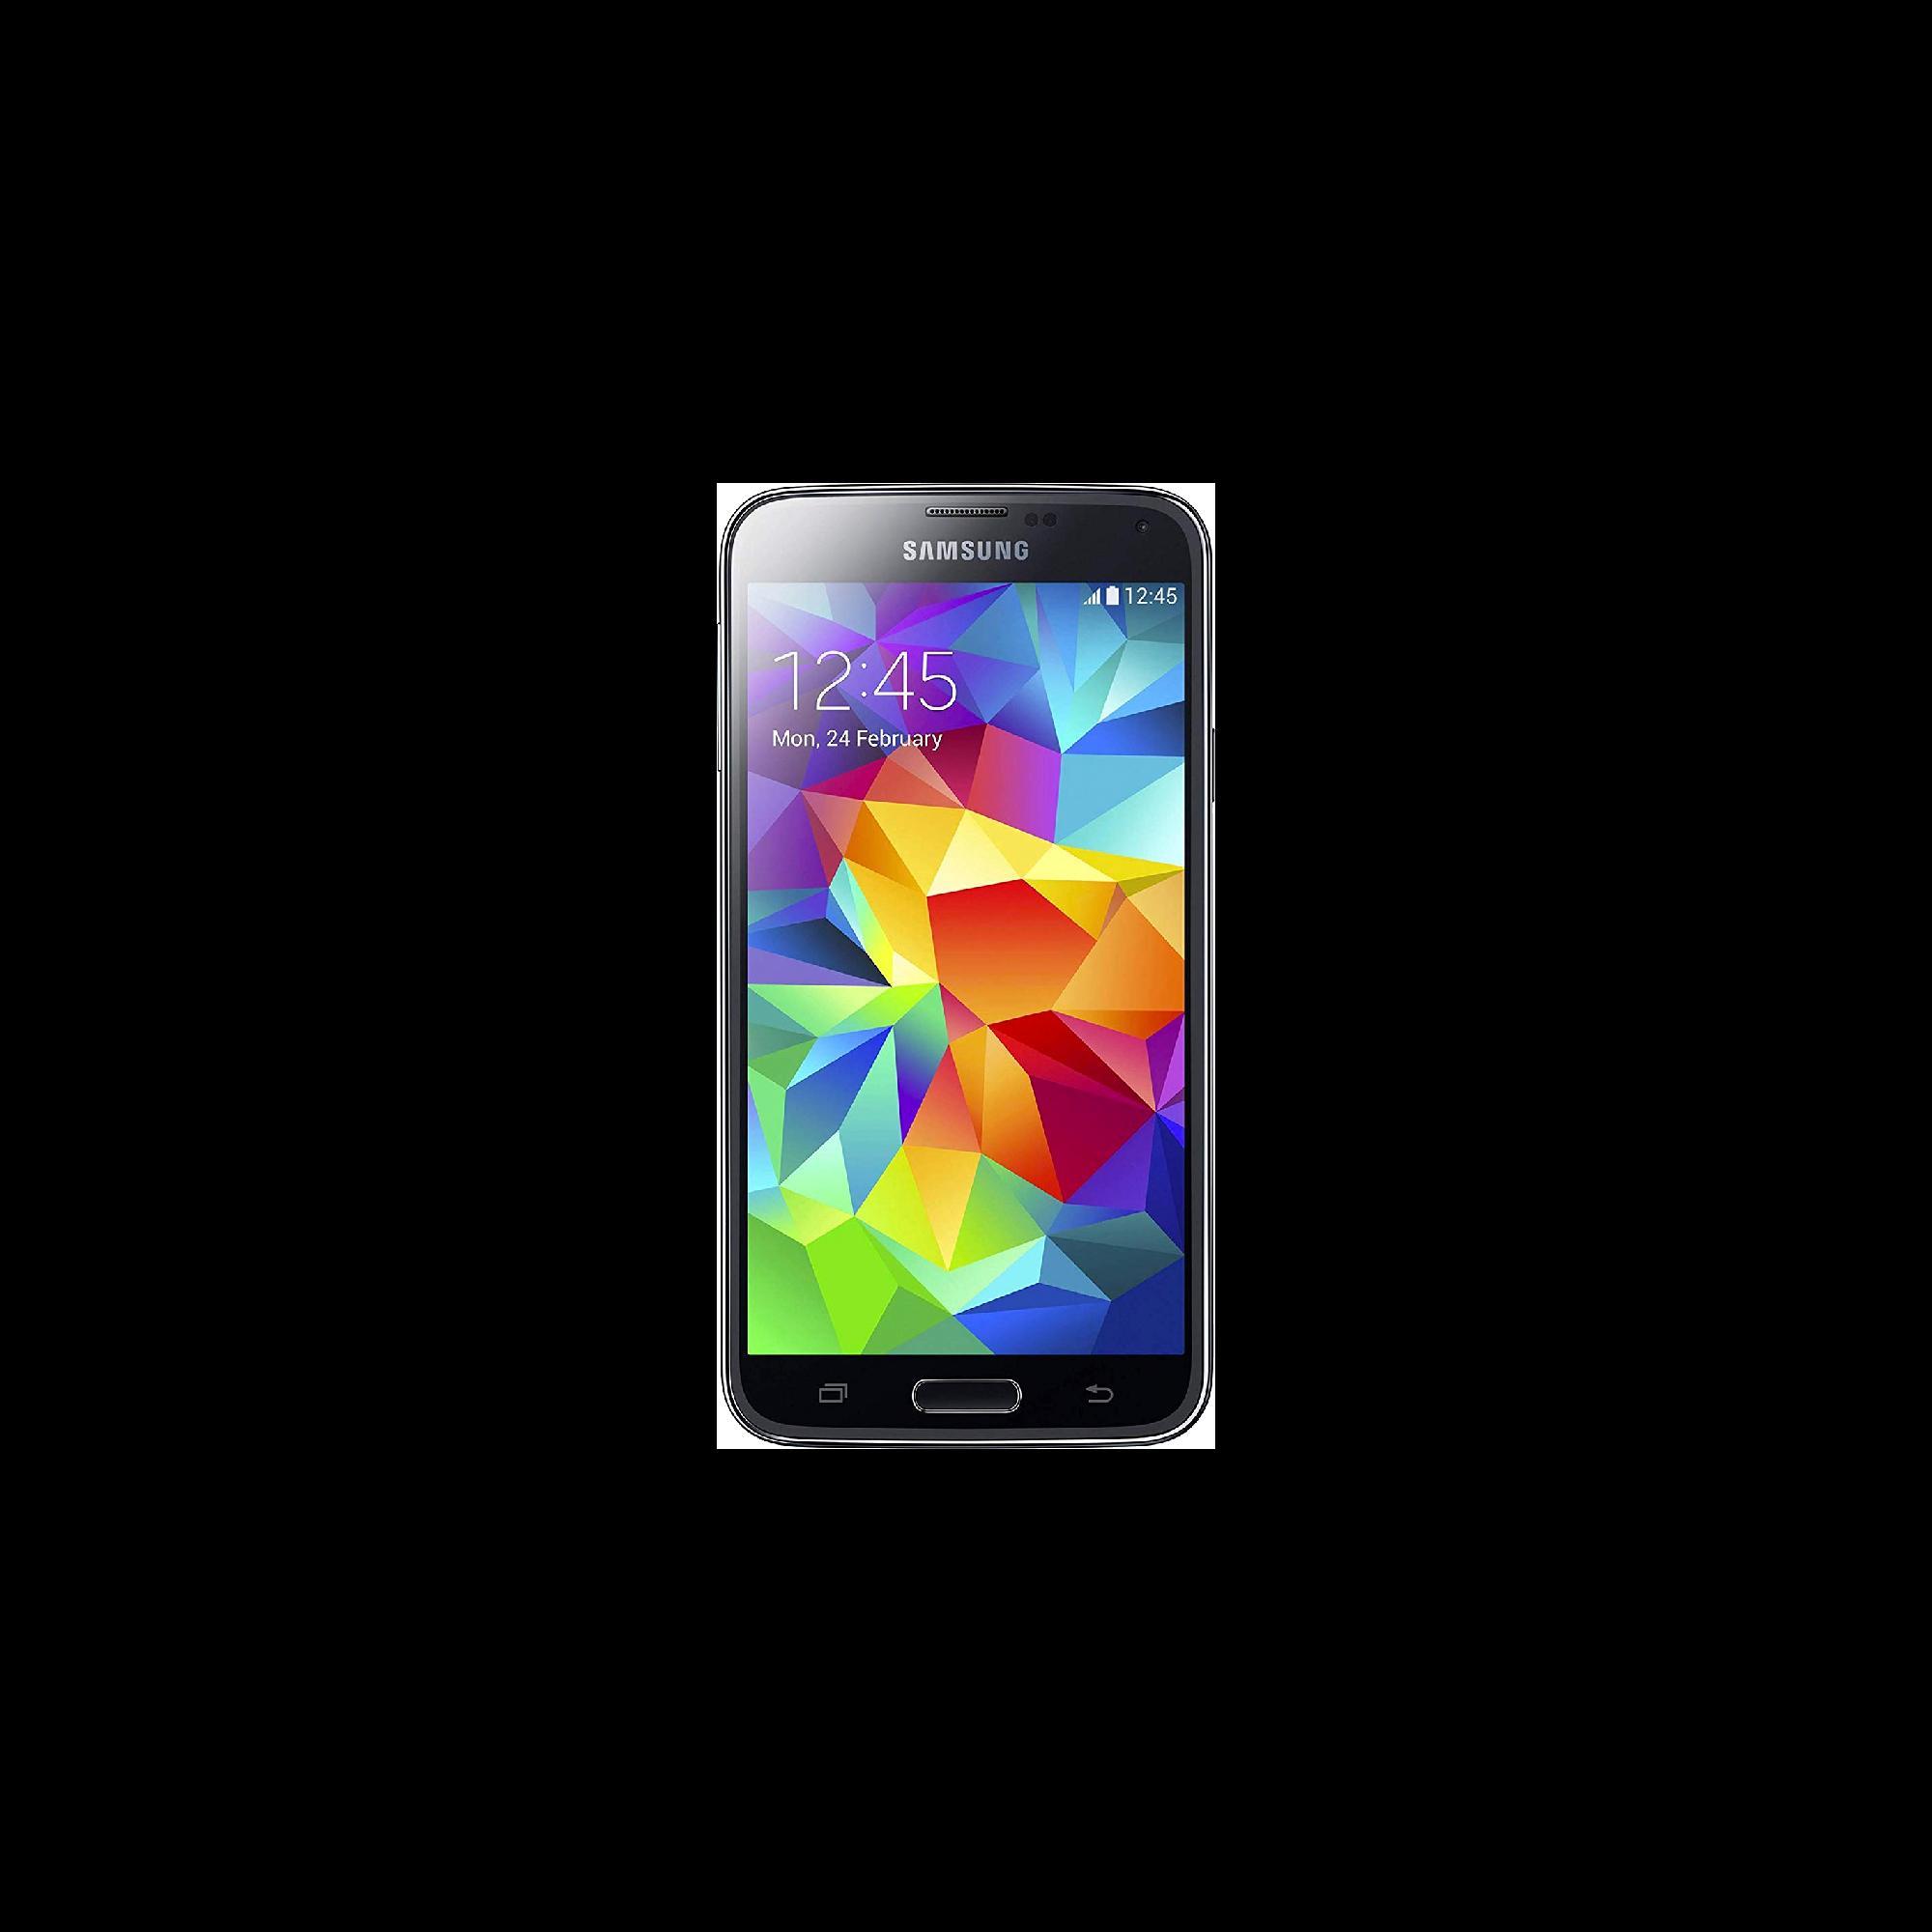 Samsung S5 | $125 + tax